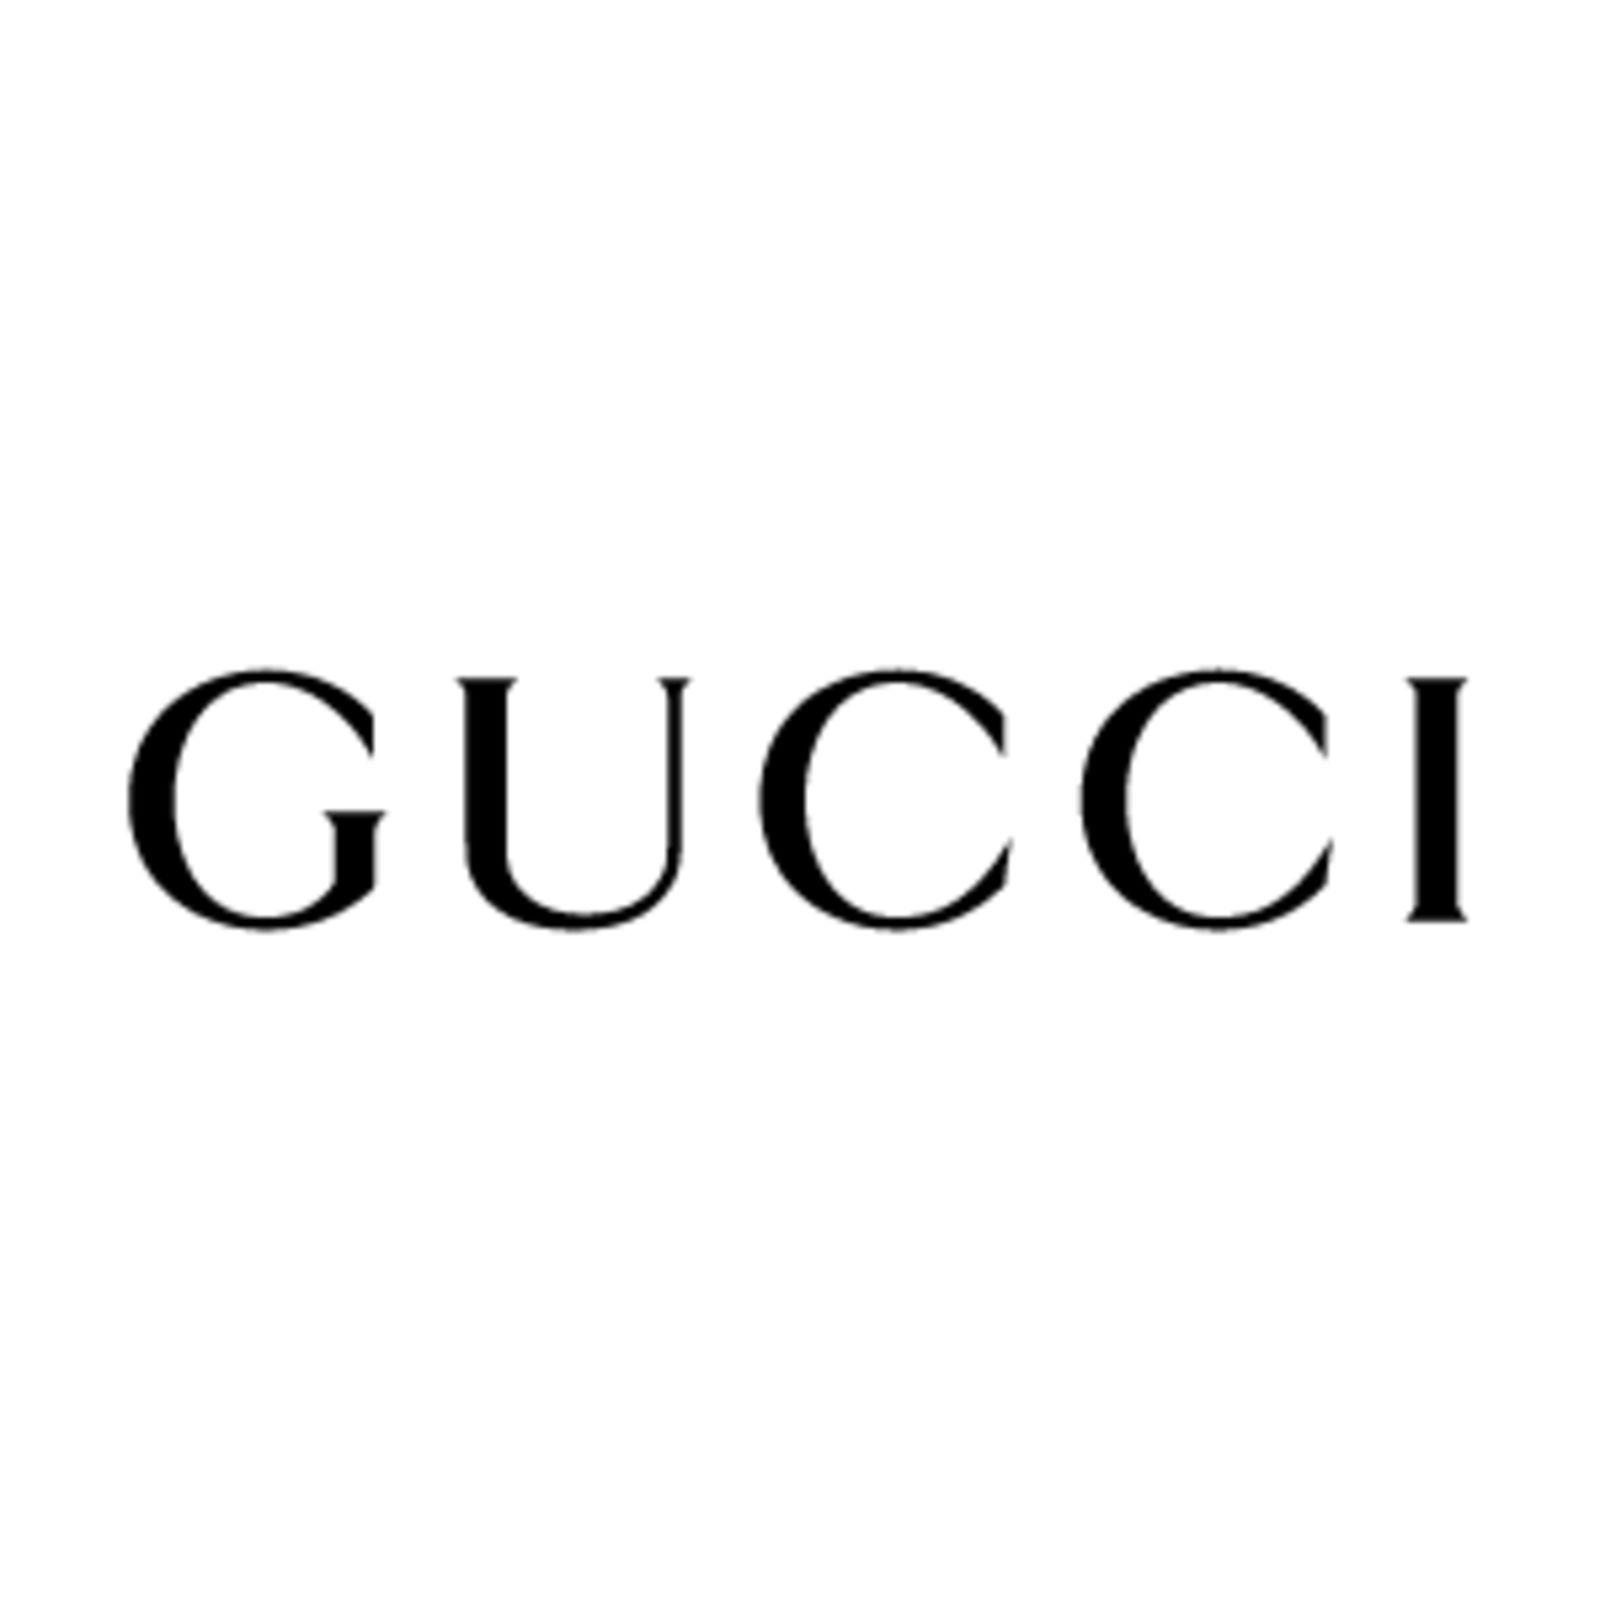 GUCCI (Bild 1)